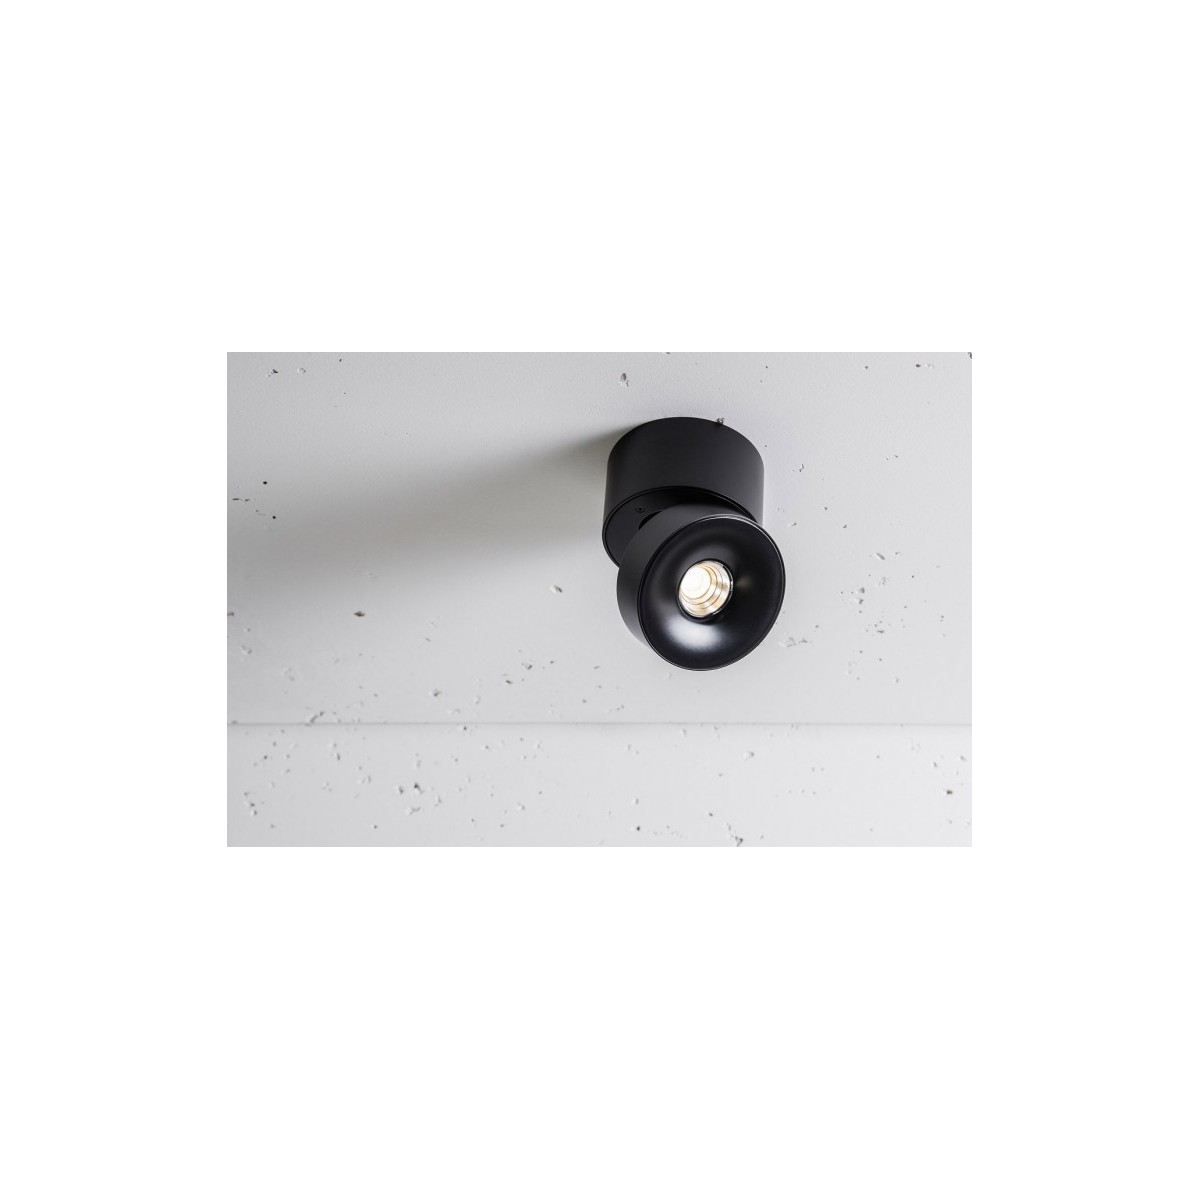 Labra GEIT NT edge.LED 12W 2-0840 Reflektor